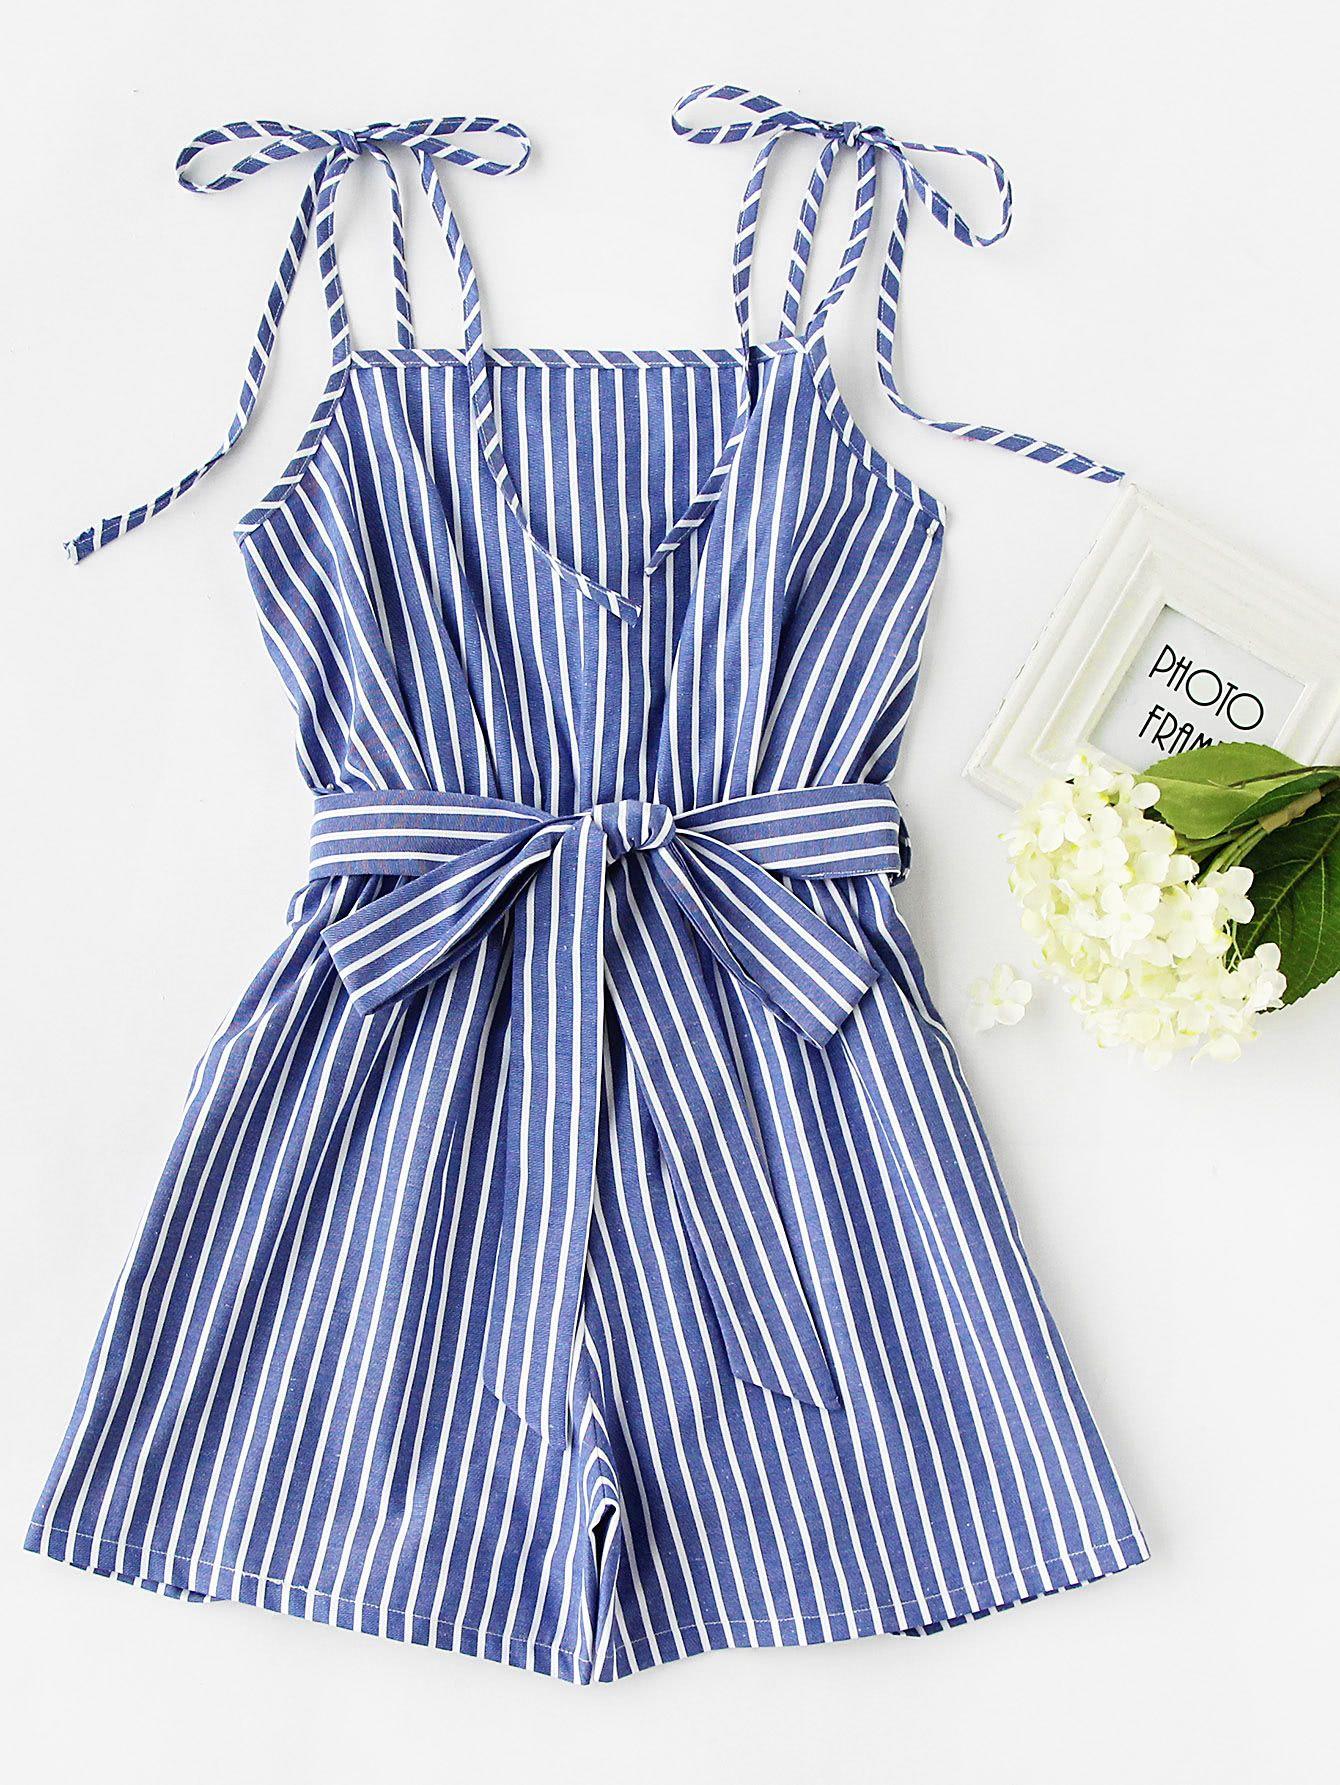 joefsf   Clothes & Acessories   Pinterest   Ropa, Enterizos de moda ...